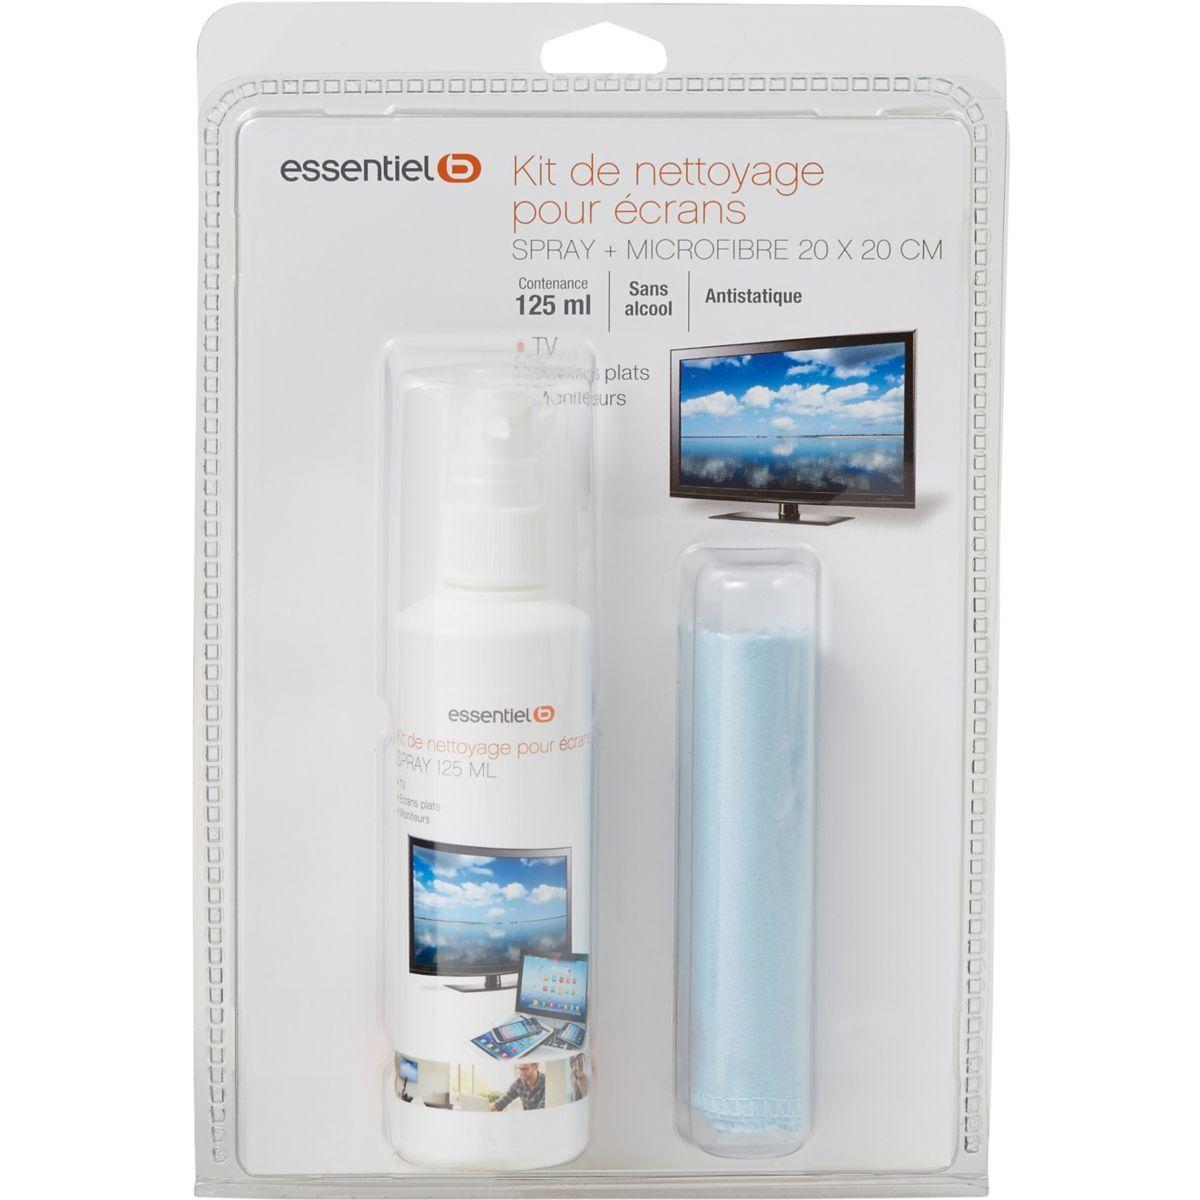 Kit de nettoyage essentielb spray 125ml+micro fibre 20x20cm (photo)